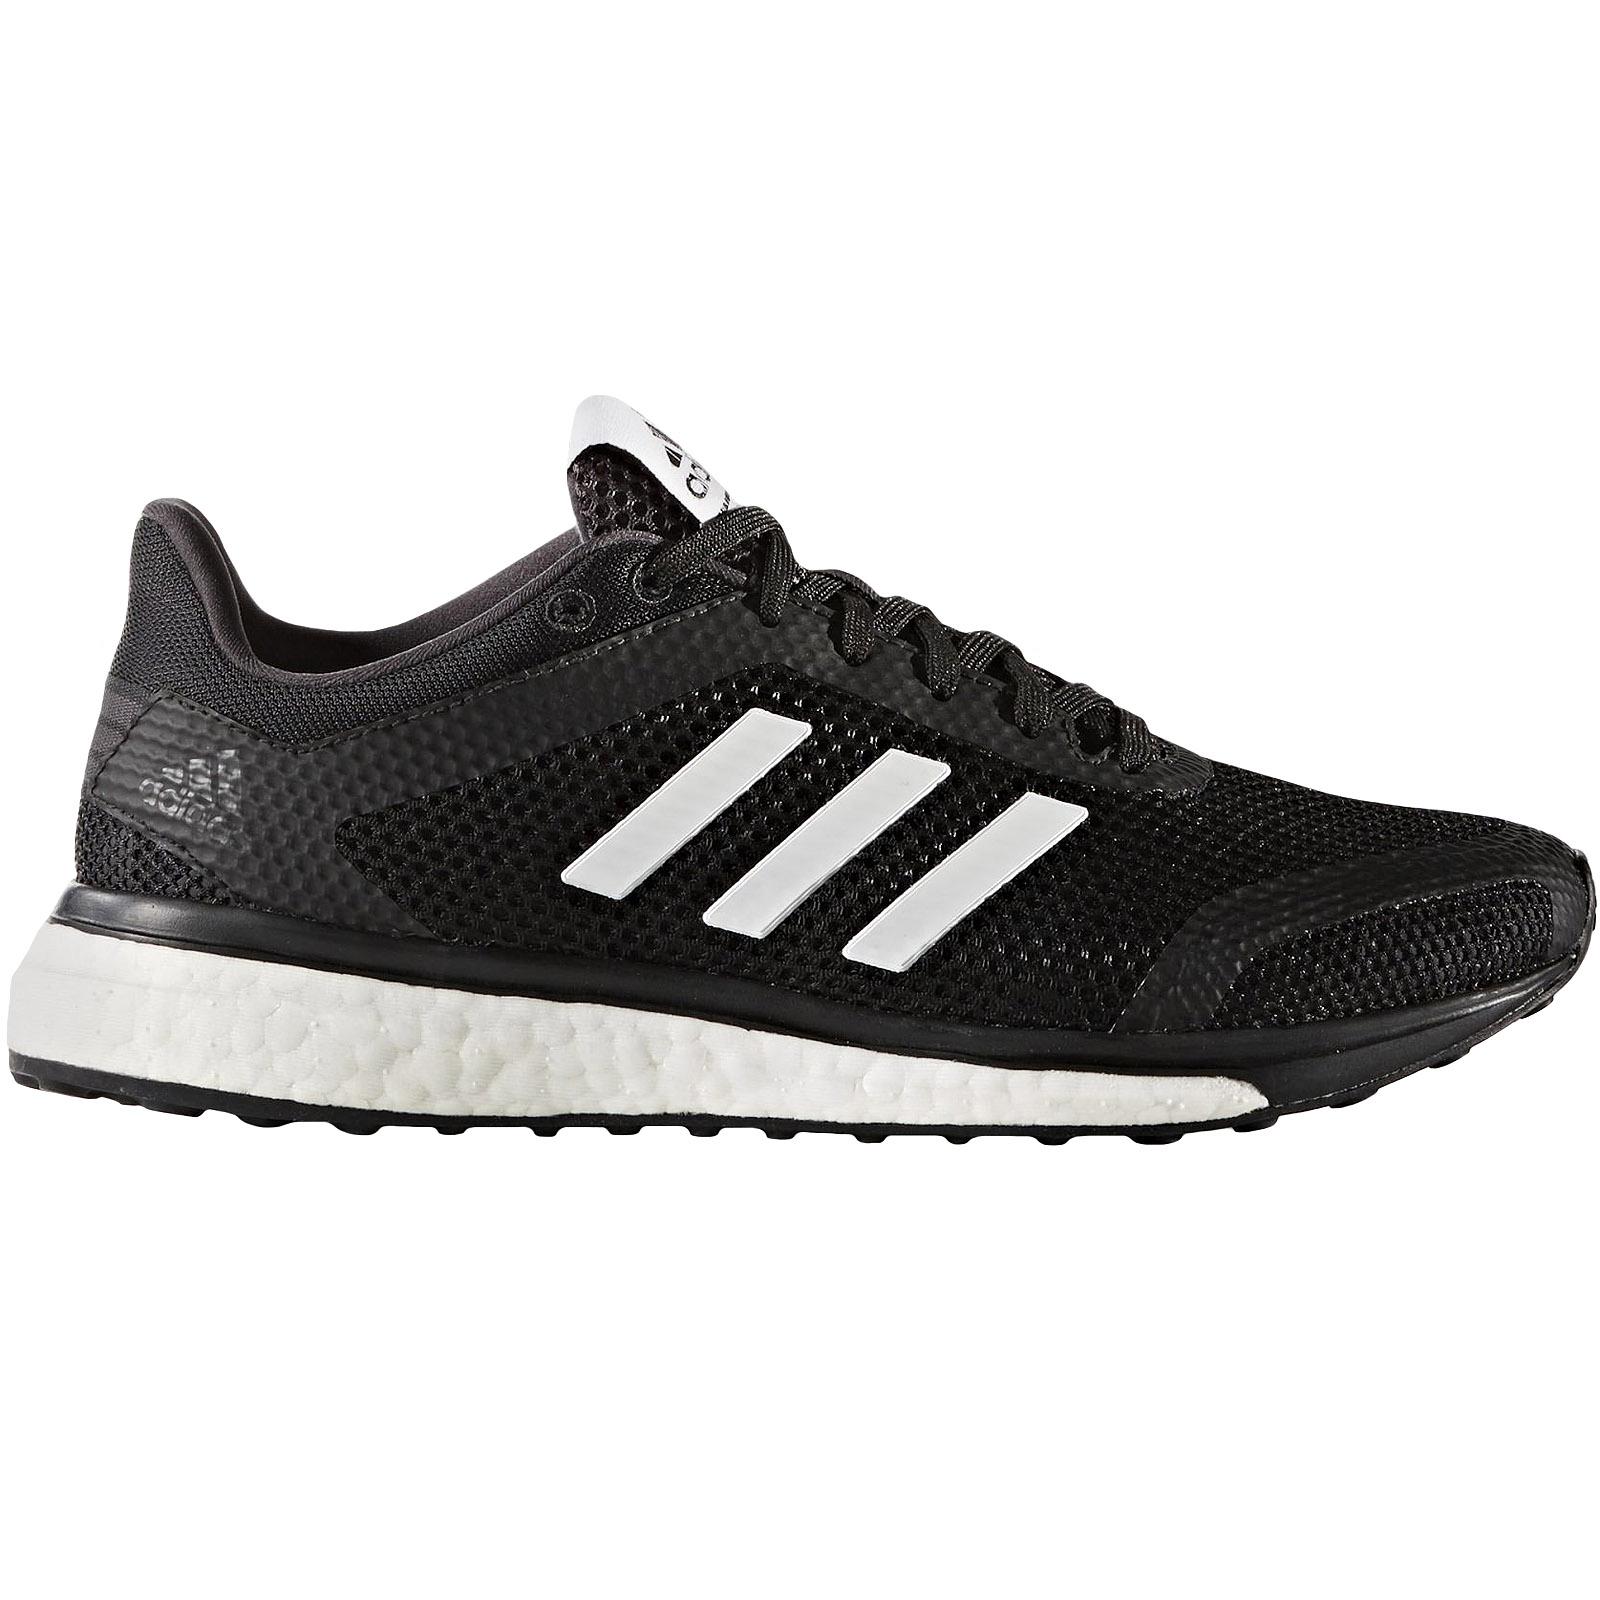 Adidas response boost techfit w Women's Running Sneakers Shoes Sz 7 Black B39889 | eBay